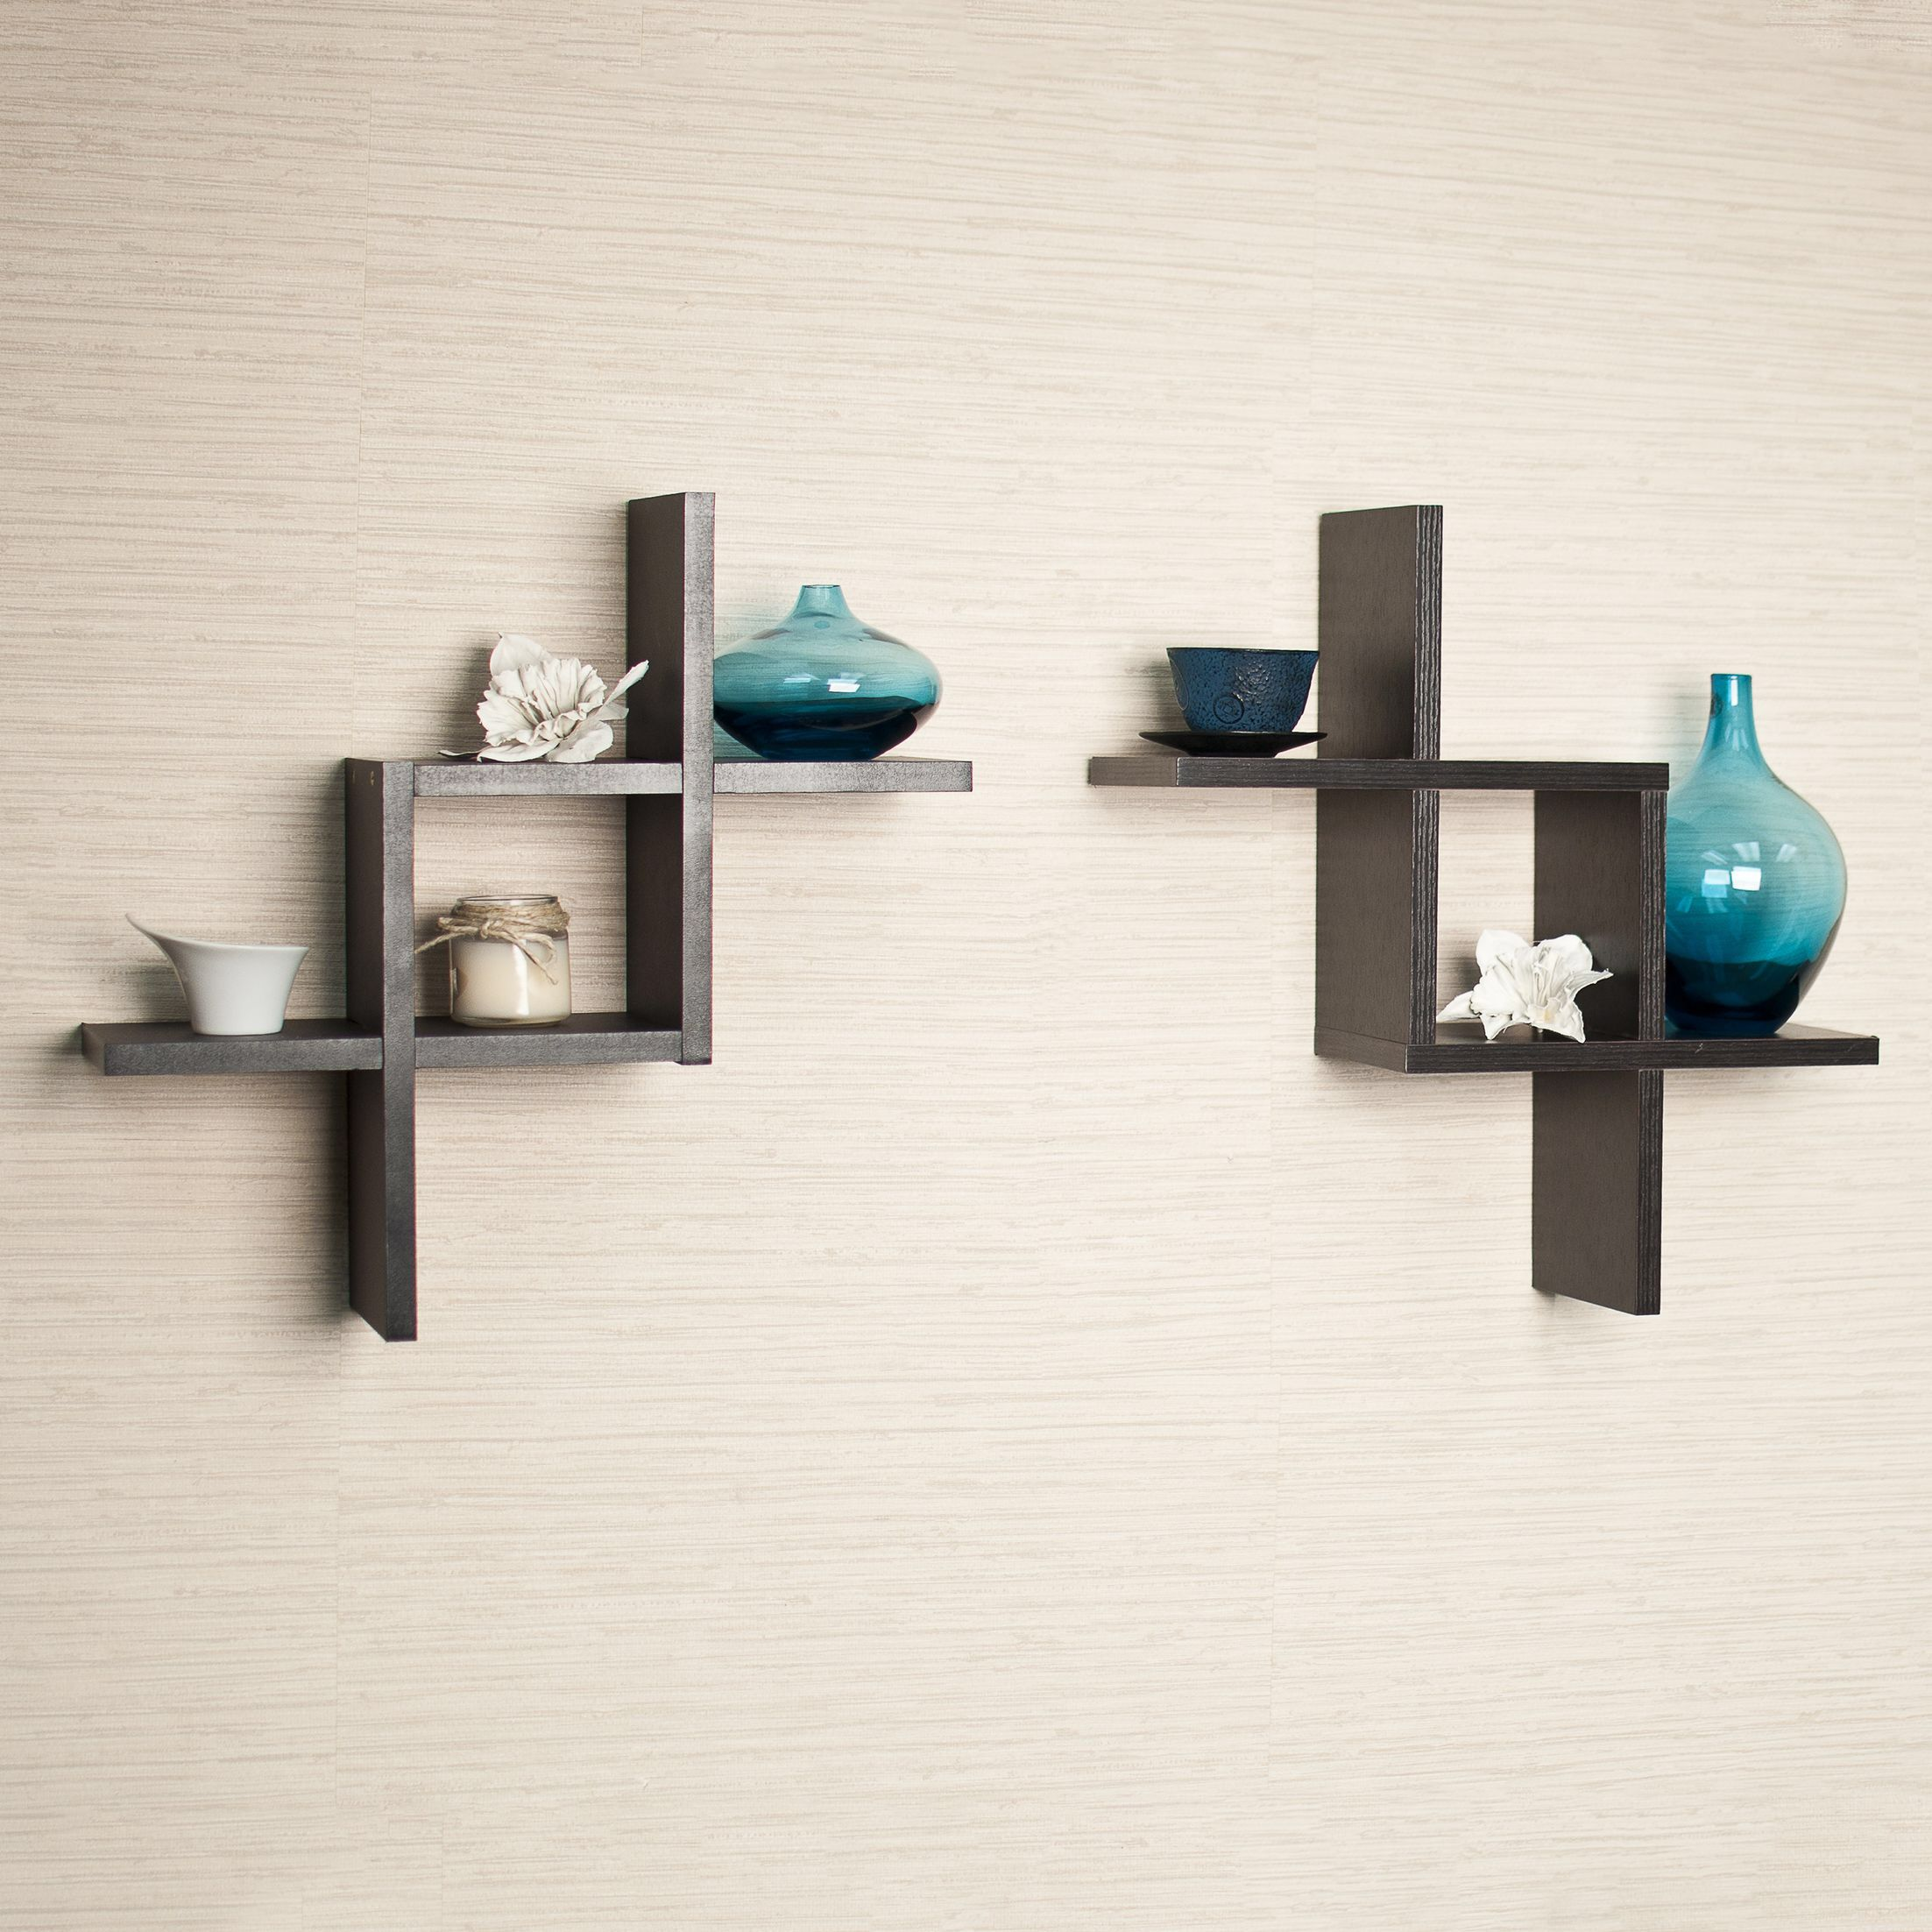 Reversed Criss Cross Wall Shelf